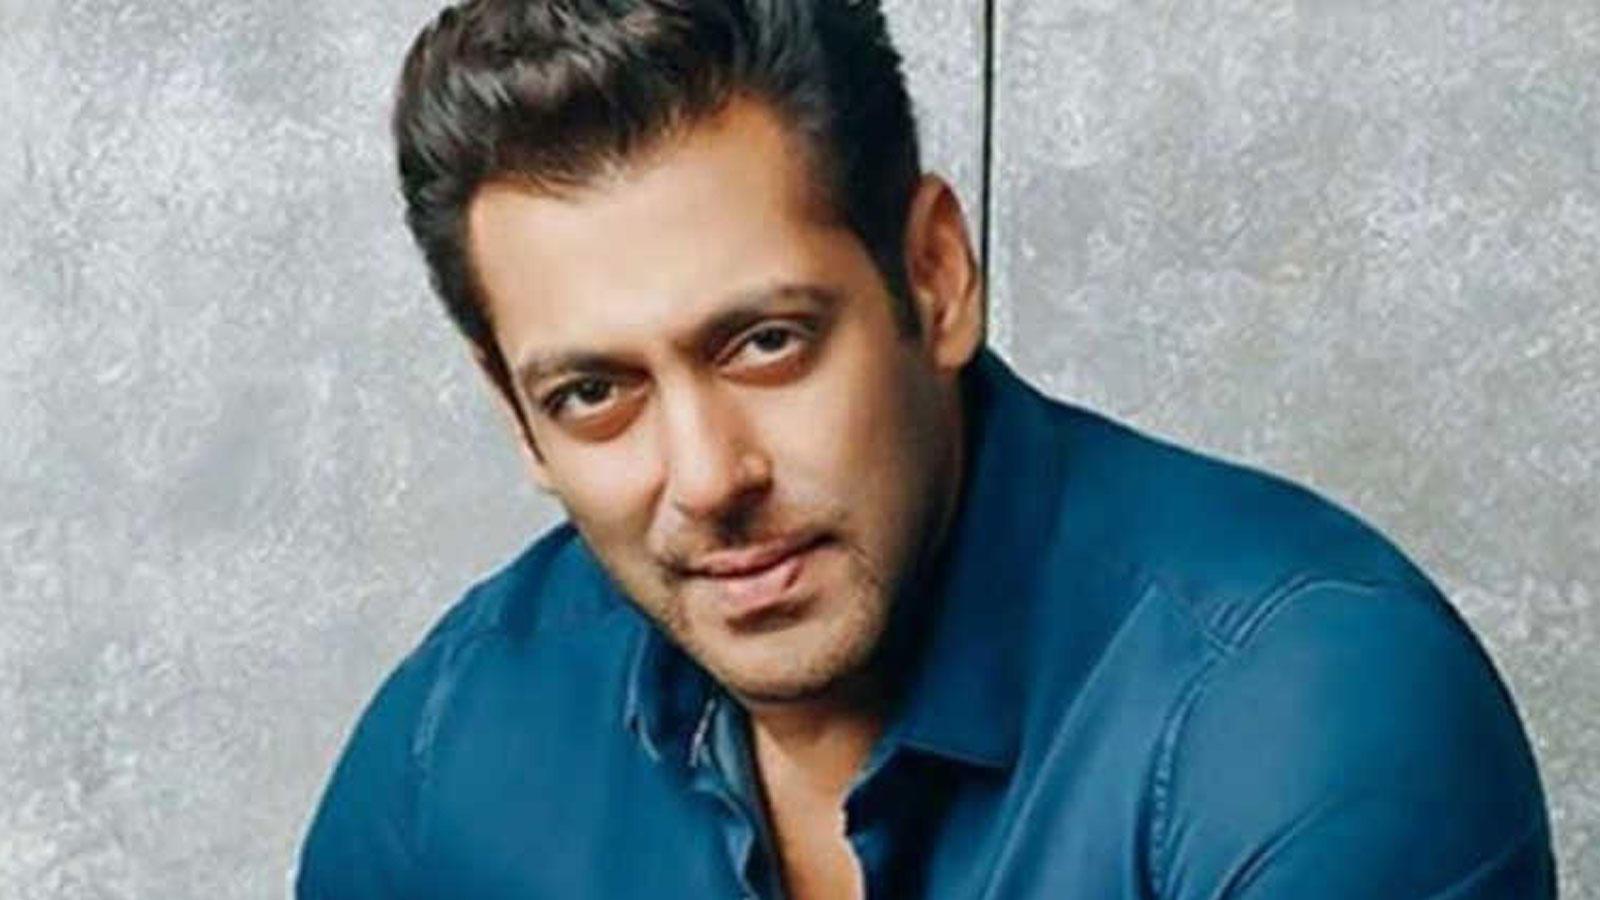 Kabhi Eid Kabhi Diwali: Salman Khan, Aayush Sharma and Zaheer Iqbal to play brothers in social comedy? | Hindi Movie News – Bollywood – Times of India